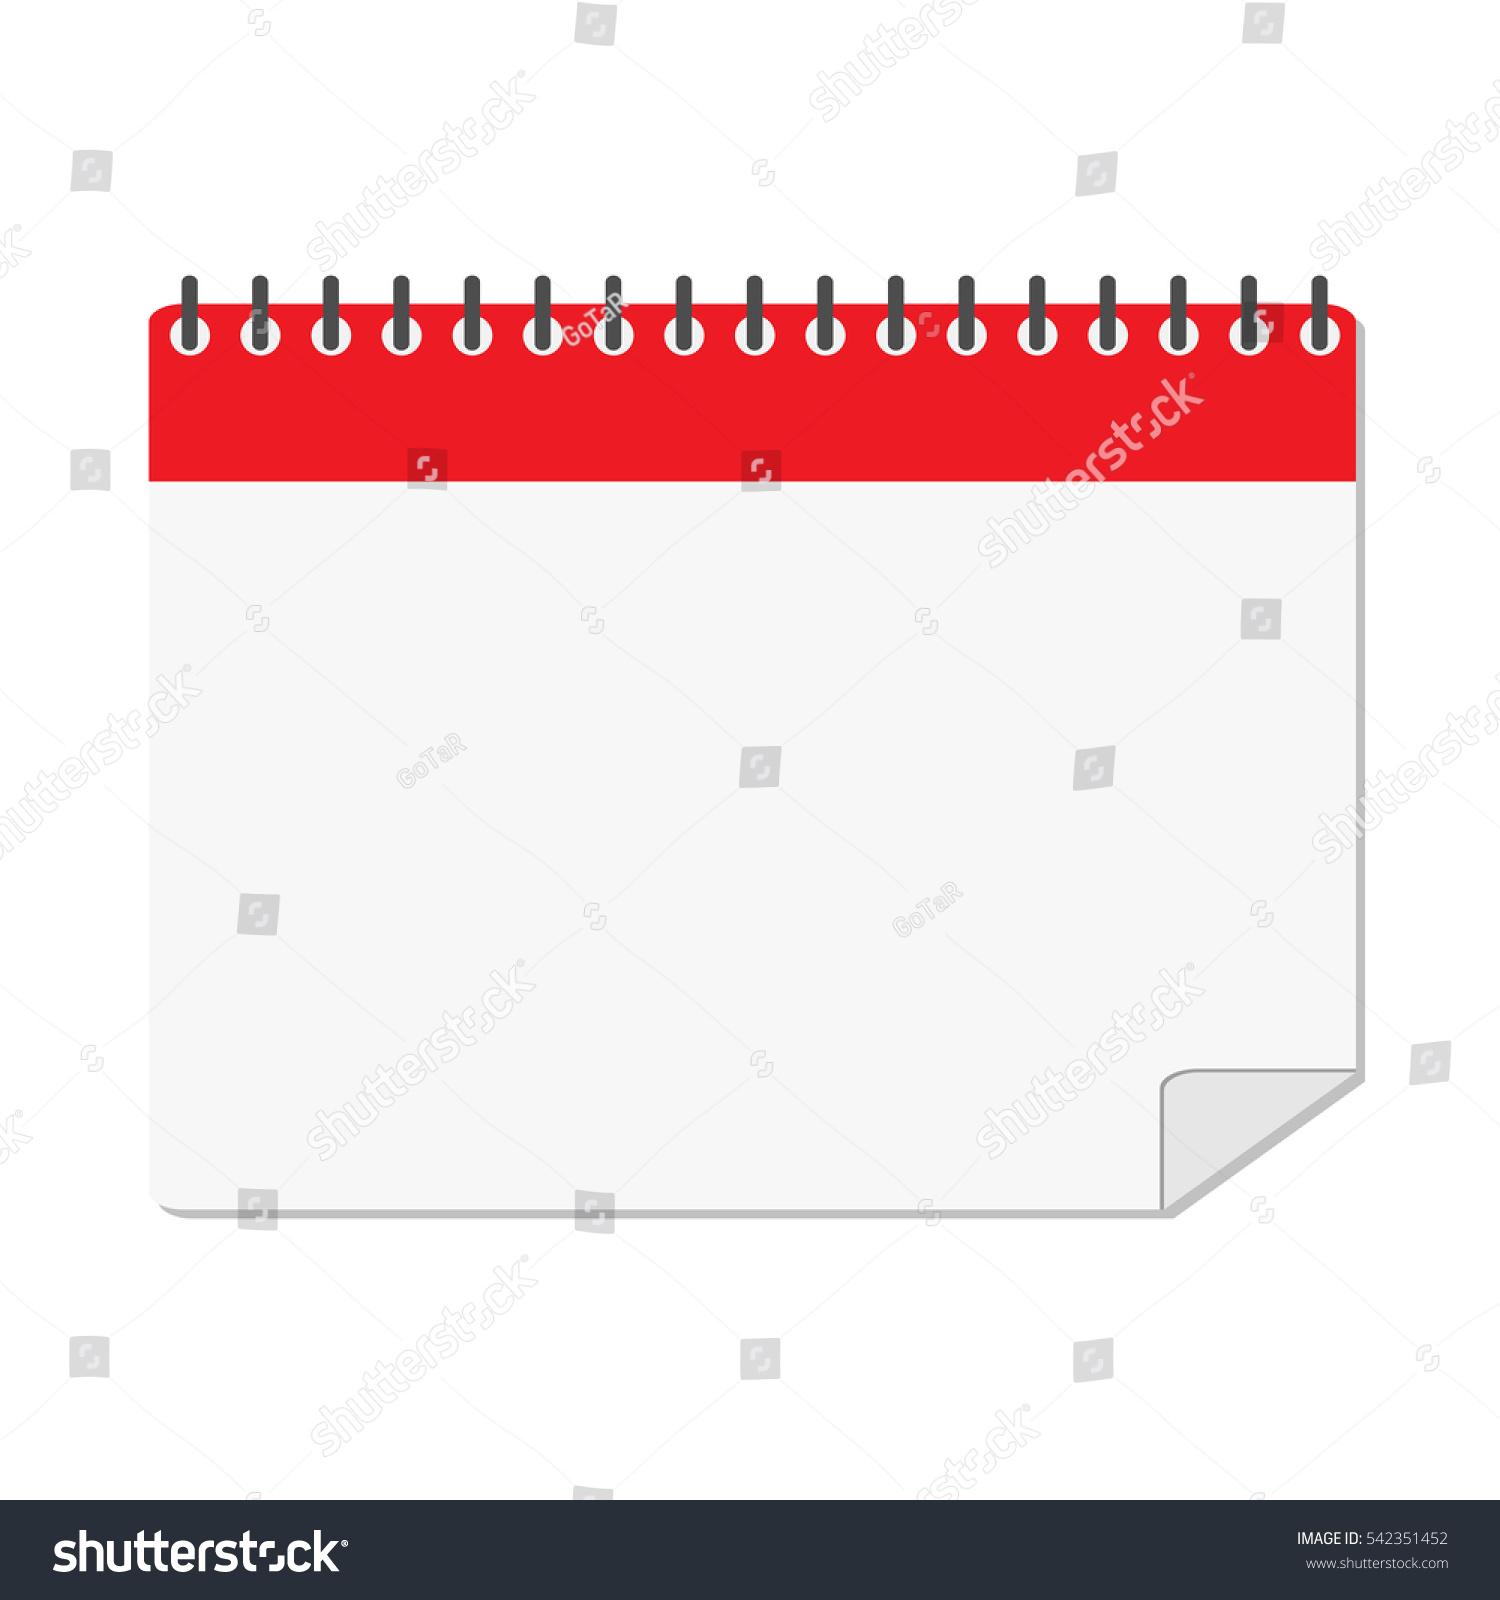 Calendar Reminder Design : Calendar reminder isolated icon design vector stock